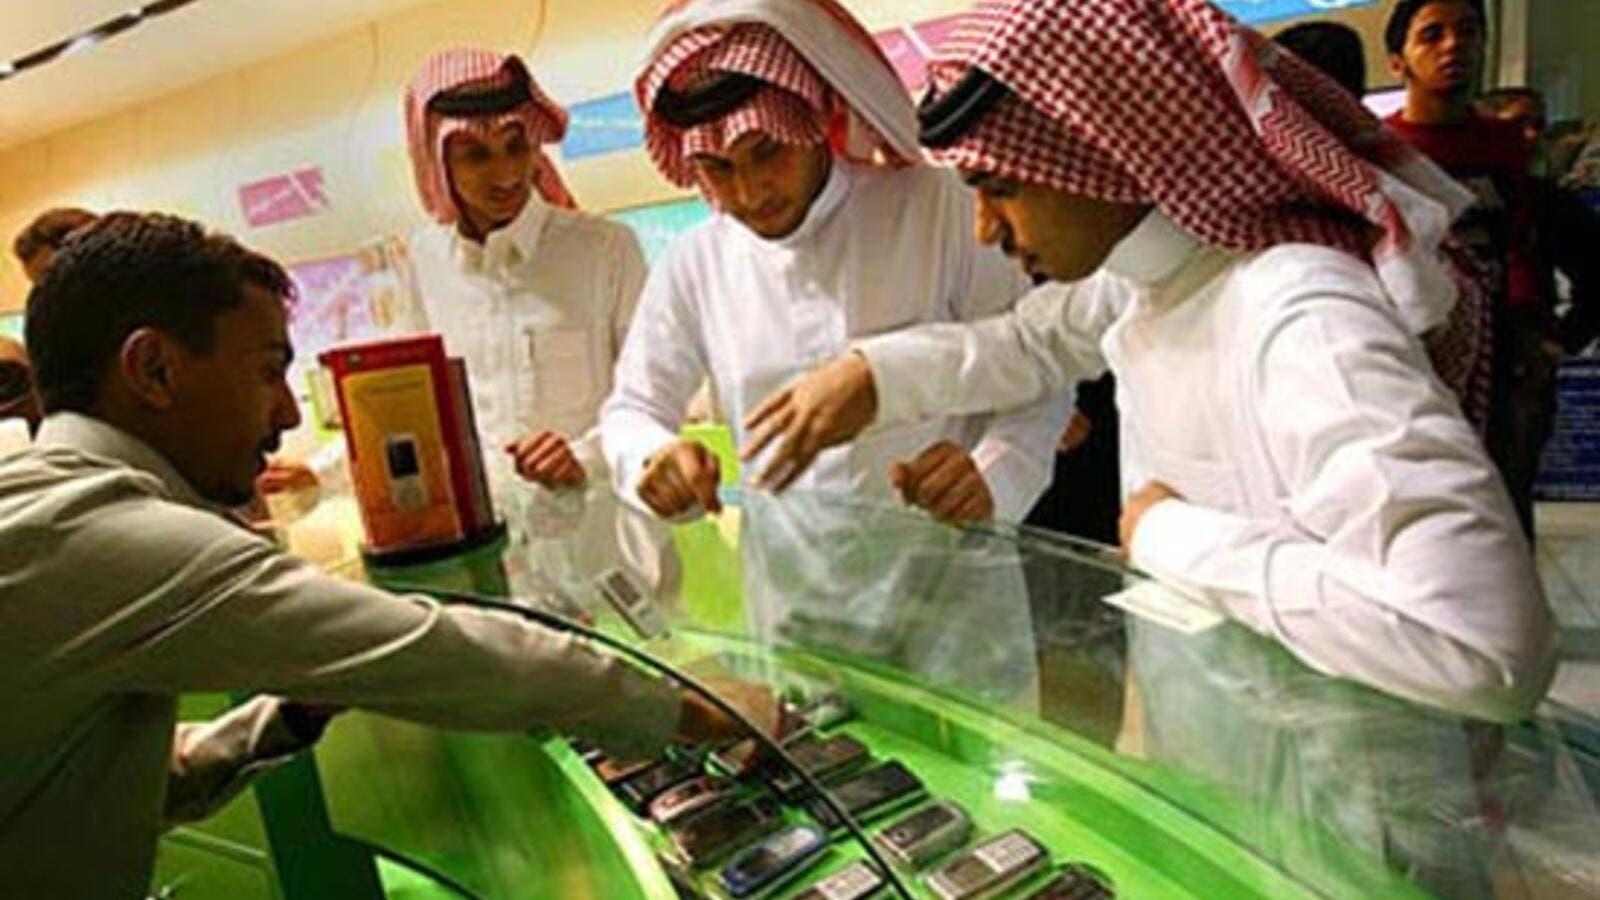 Saudi Arabia shutters over 1000 mobile phone shops over Saudization